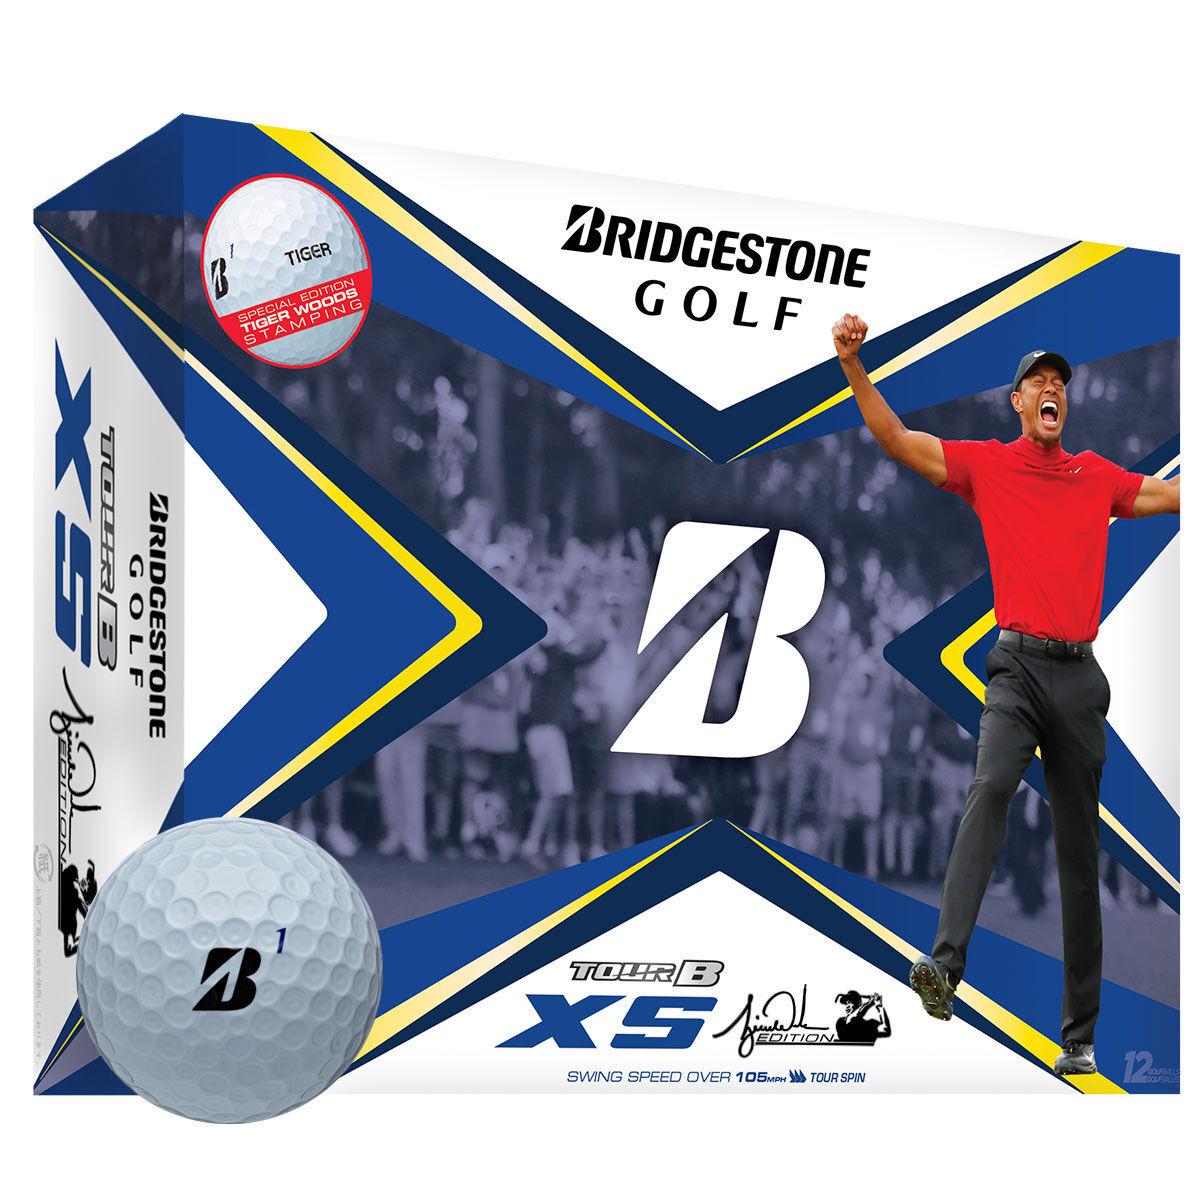 Bridgestone Golf White Tour B XS Tiger Woods Edition Pack of 12 Golf Balls, One Size | American Golf